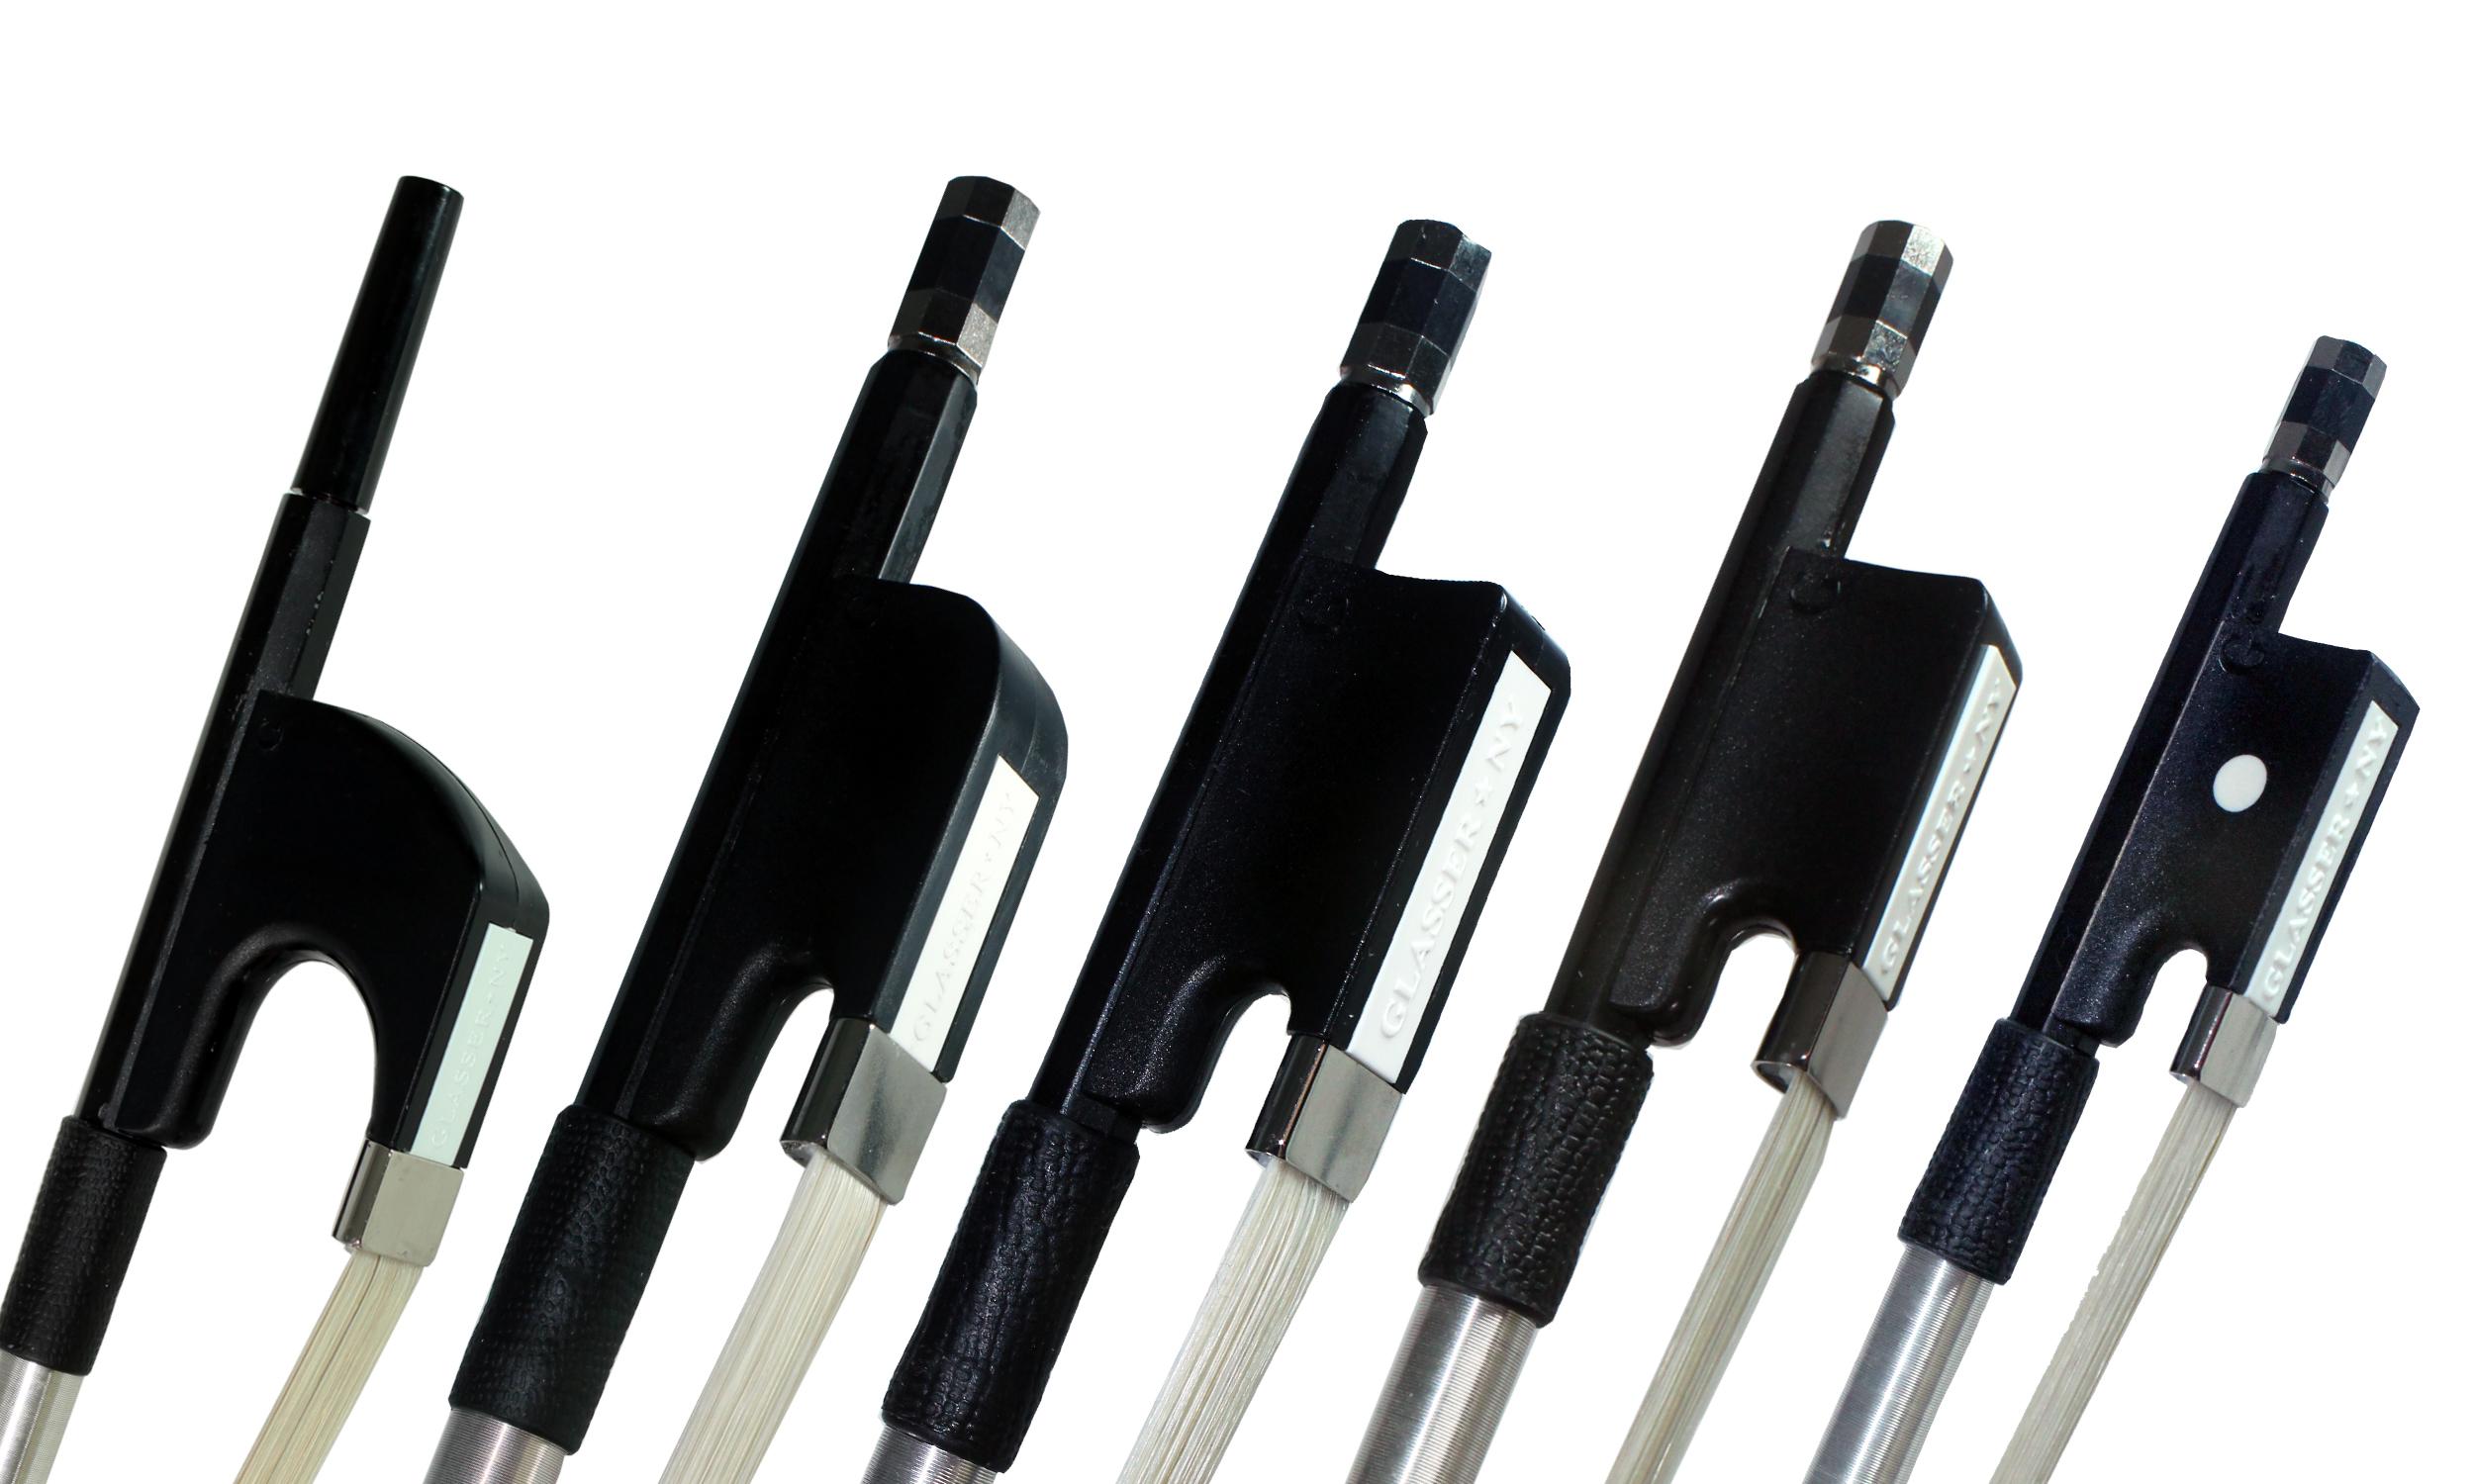 Glasser SH Series Bows